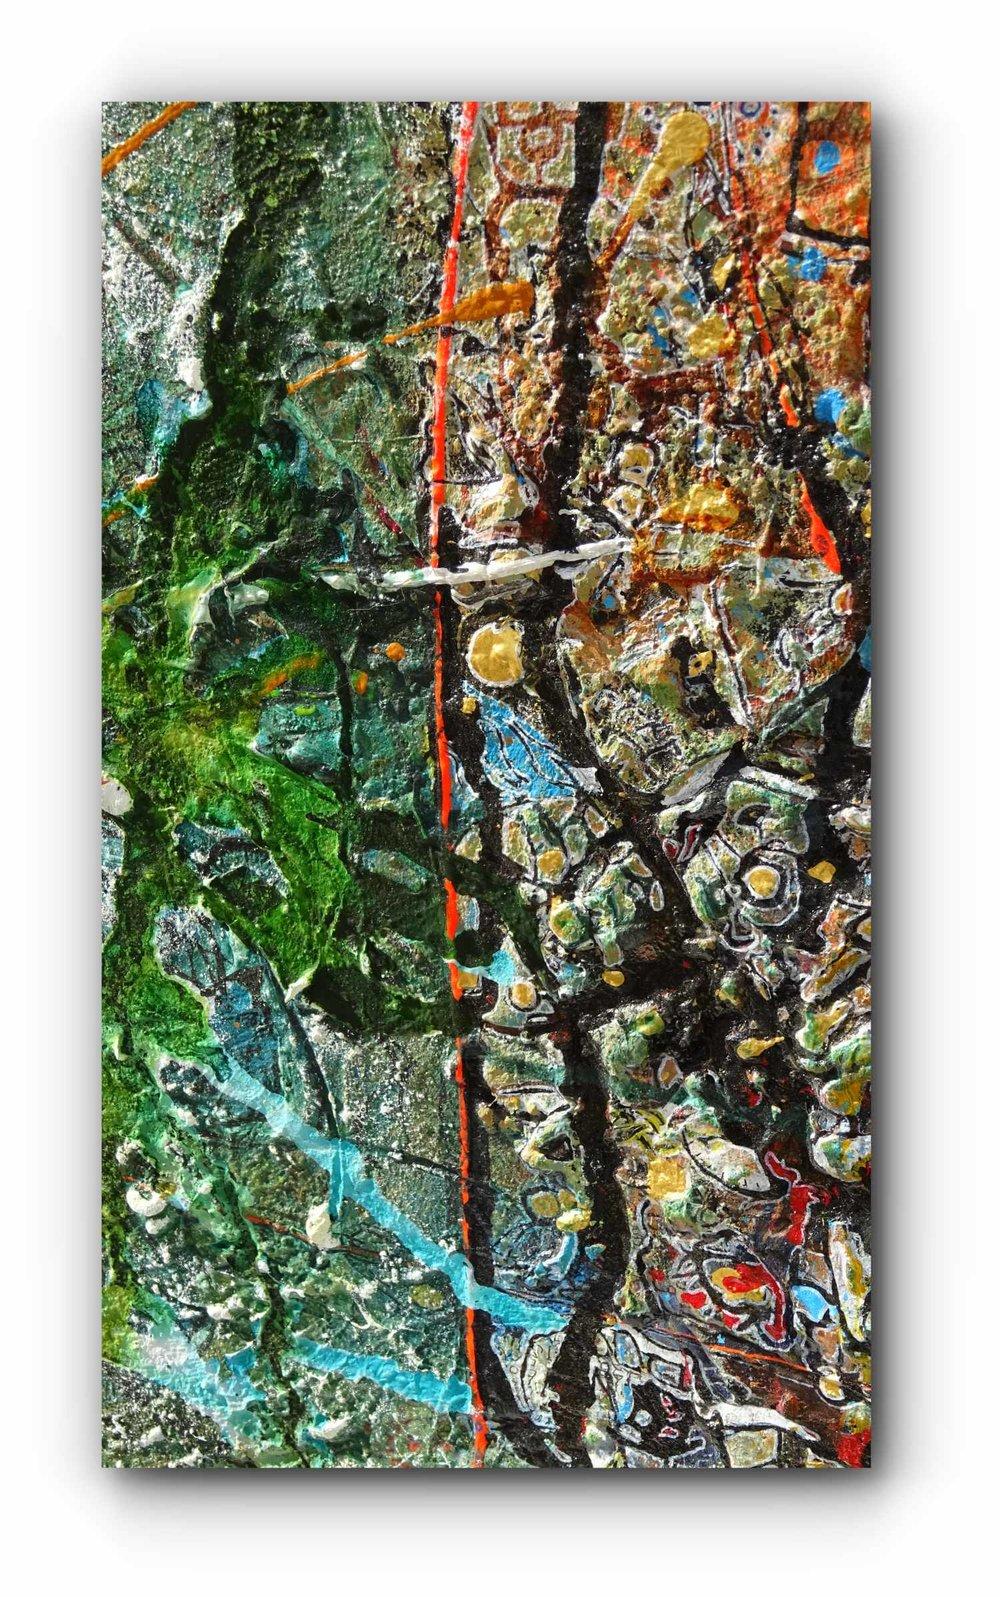 painting-detail-6-ritual-five-artists-ingress-vortices.jpg